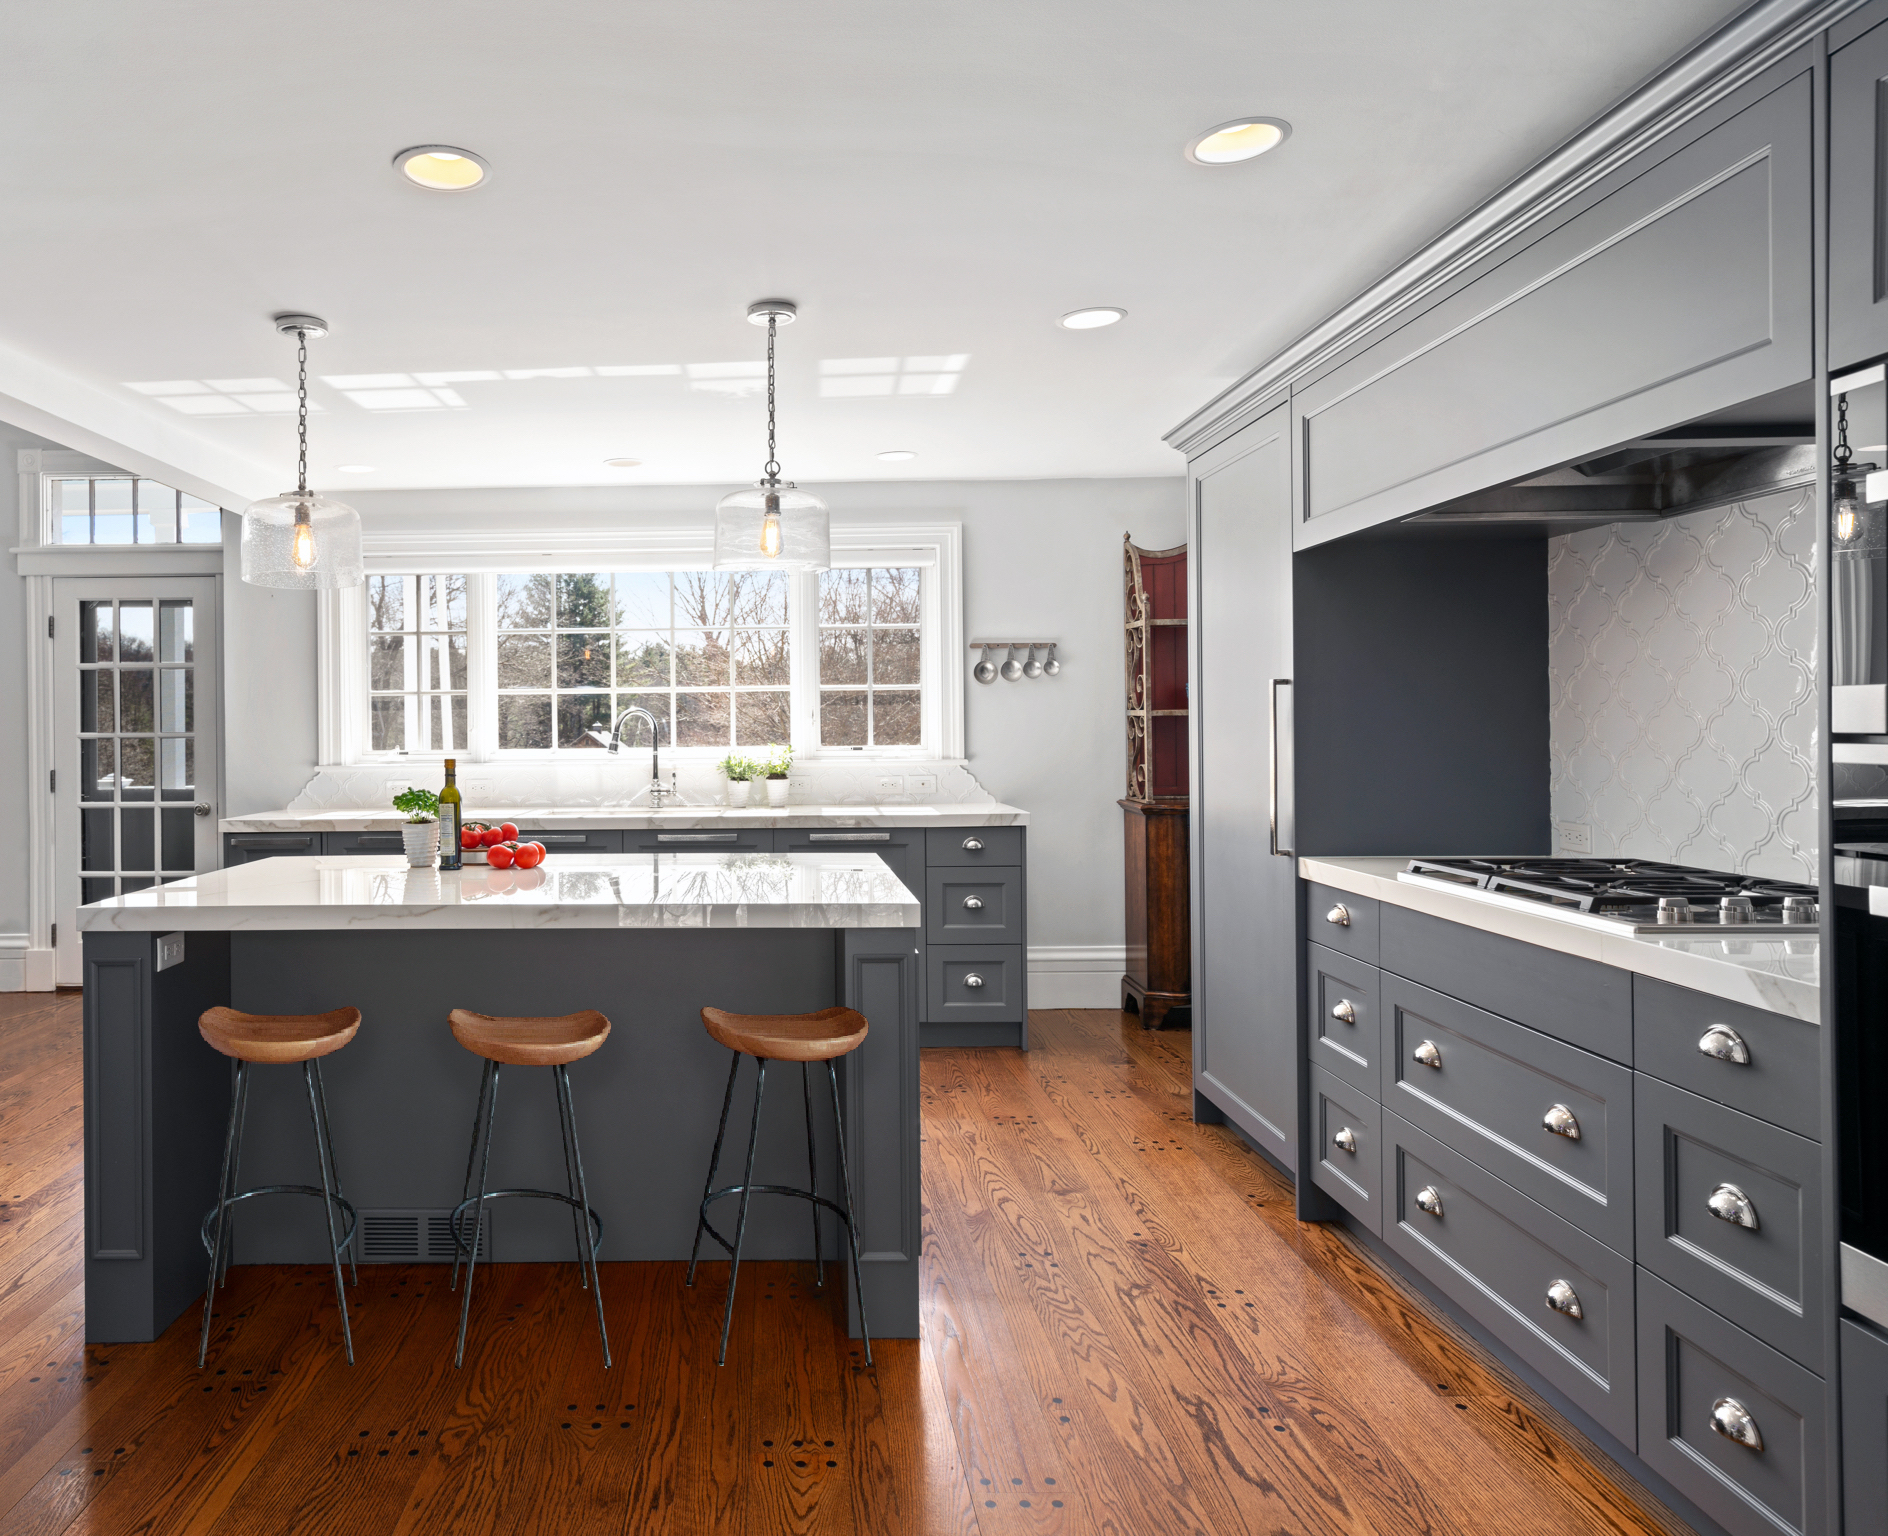 Modern Farmhouse Kitchen by Sacha Jacq Interiors